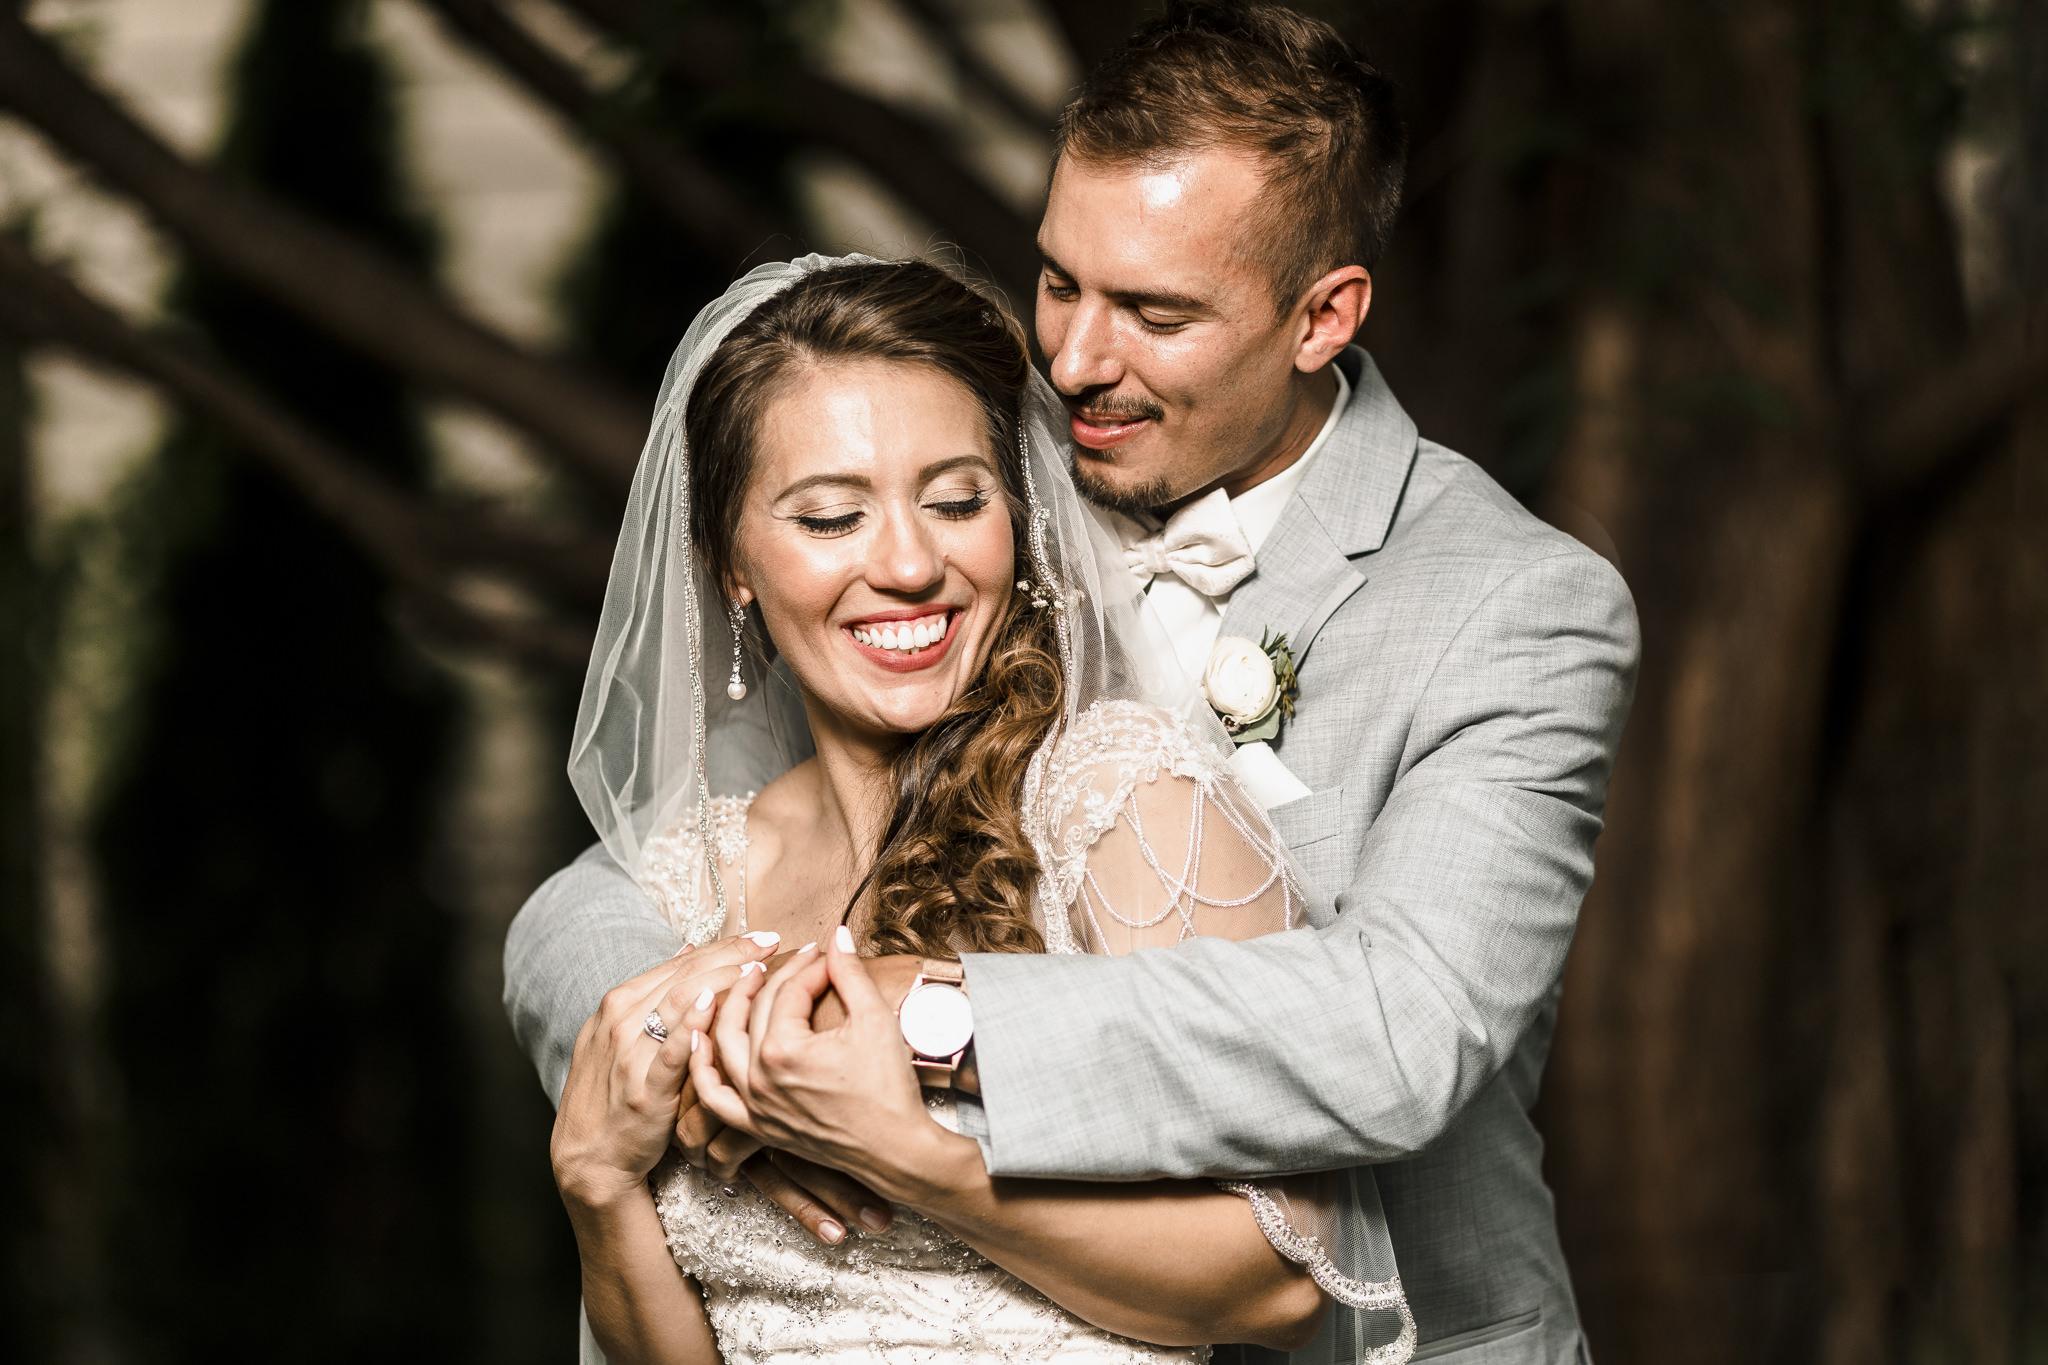 Barbato-Moorestown-Community-House-Wedding-New-Jersey-Photographer-20.JPG